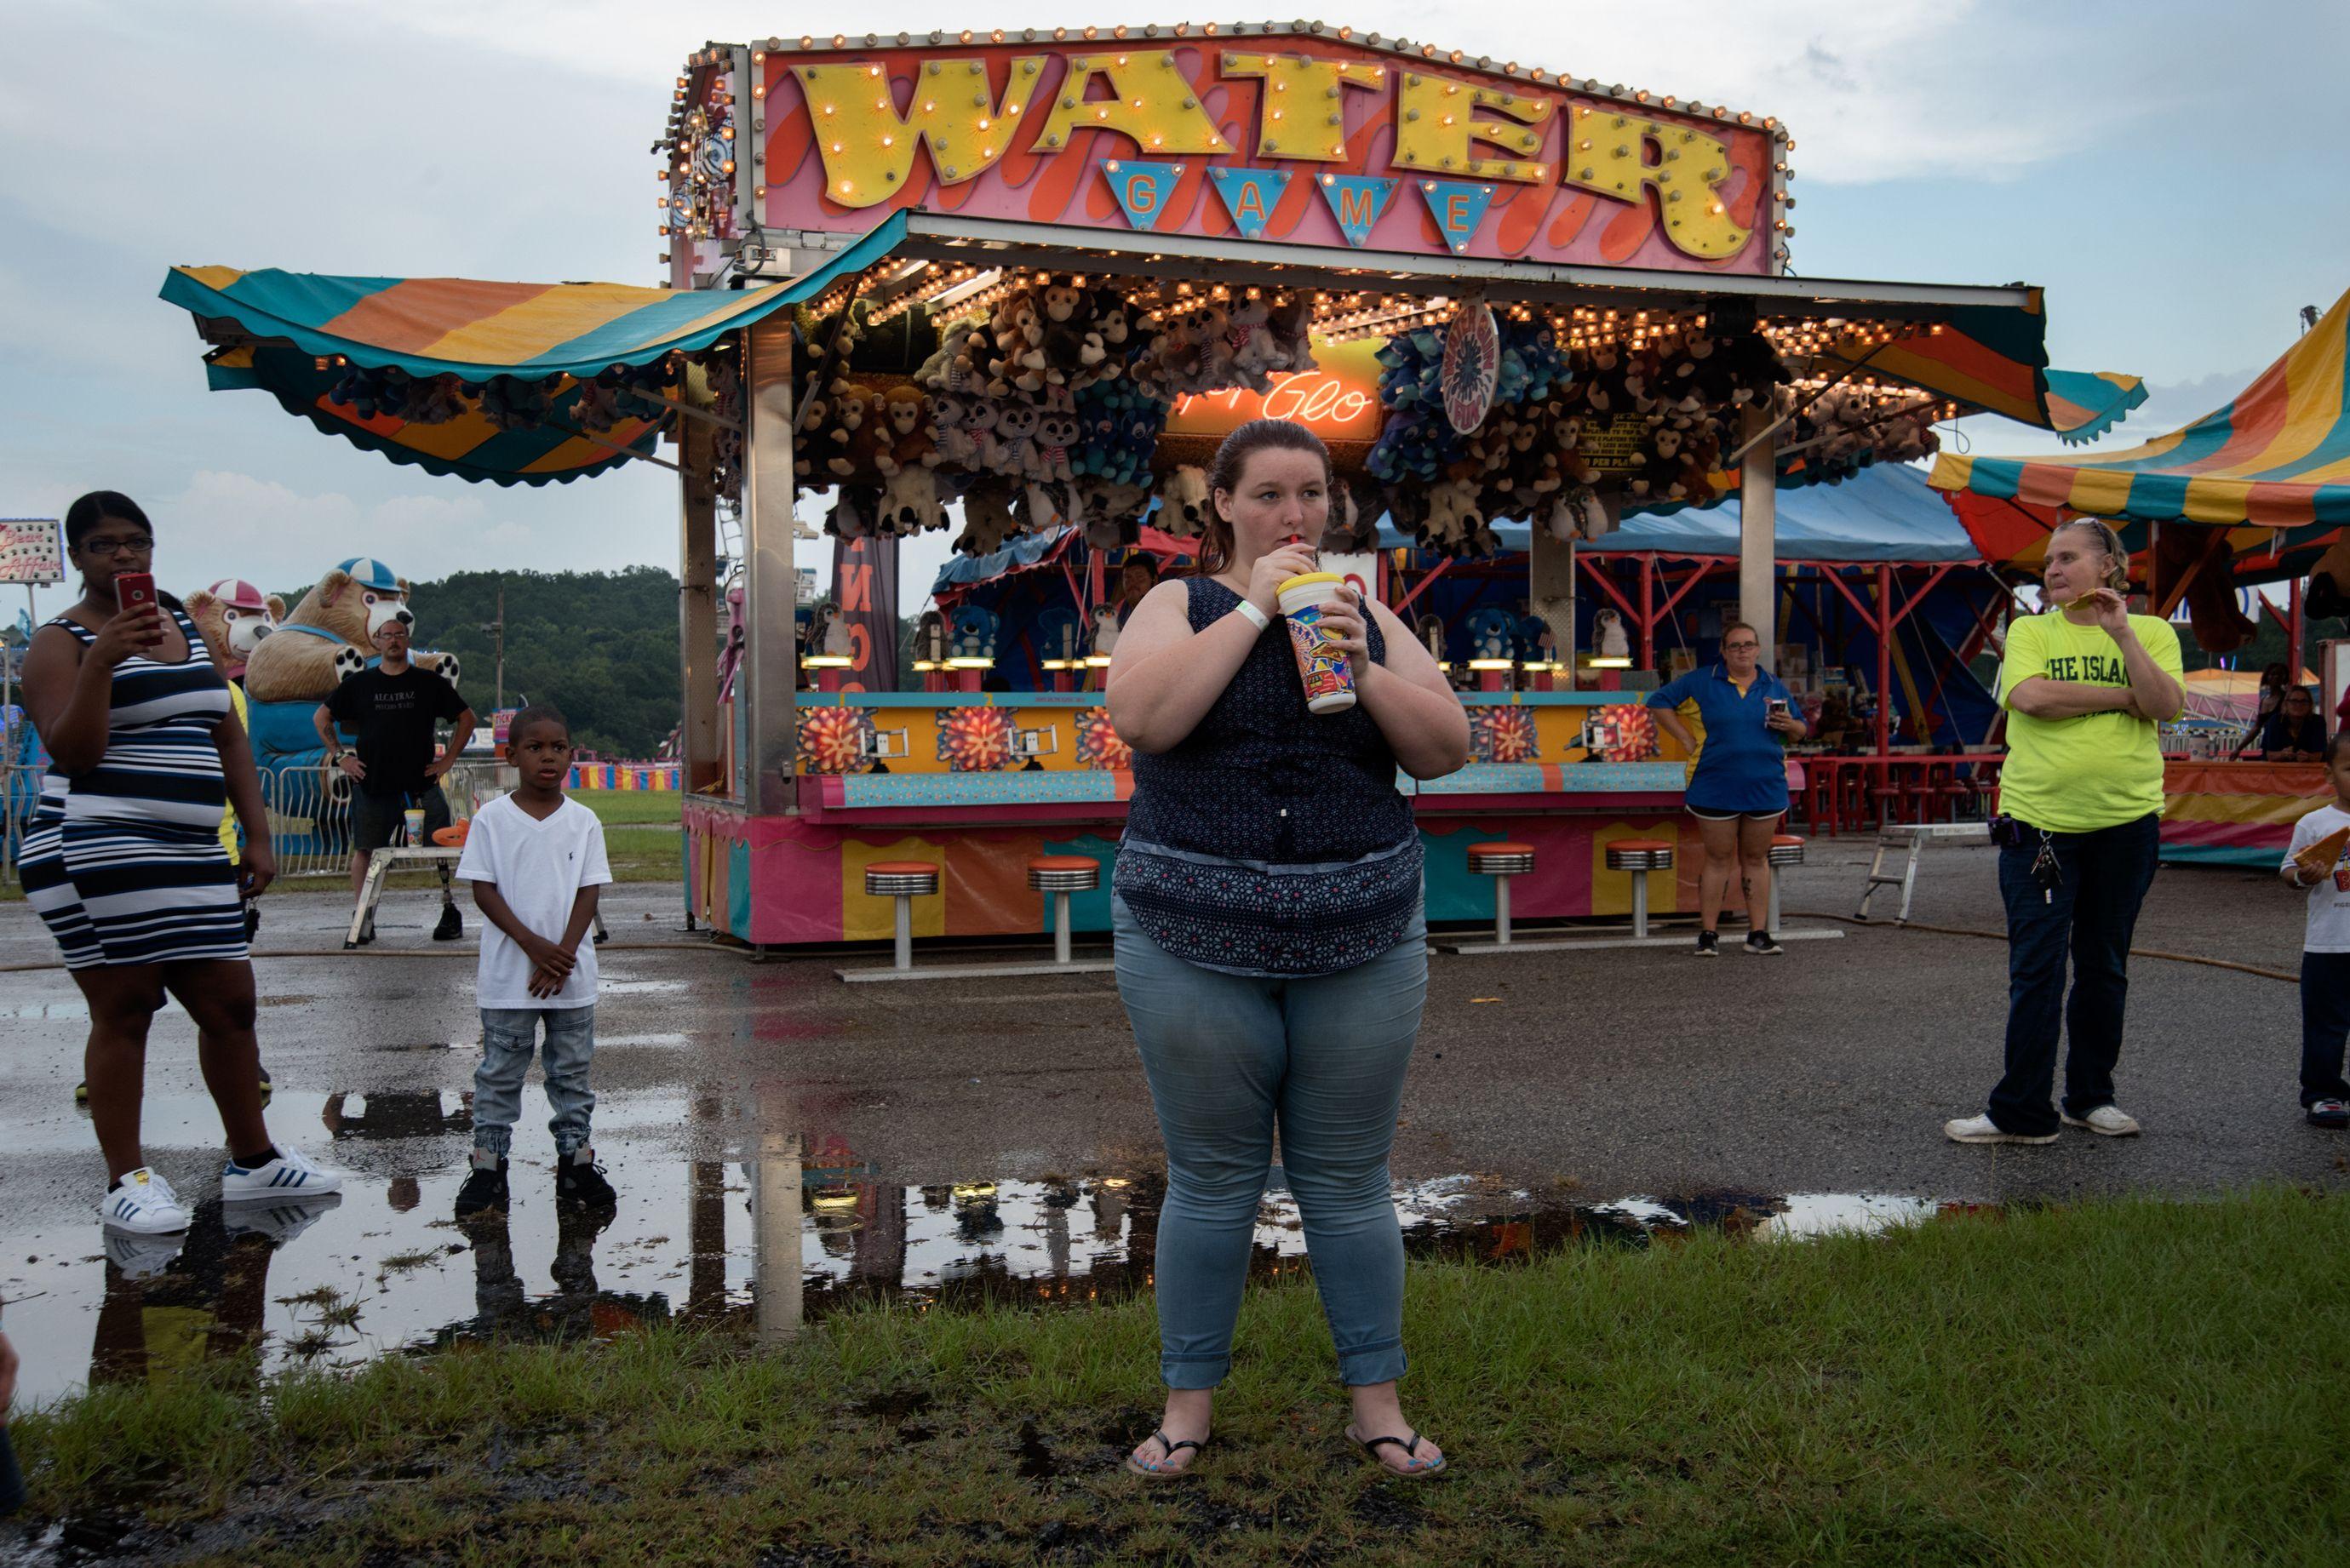 At the fair. (7 of 10)